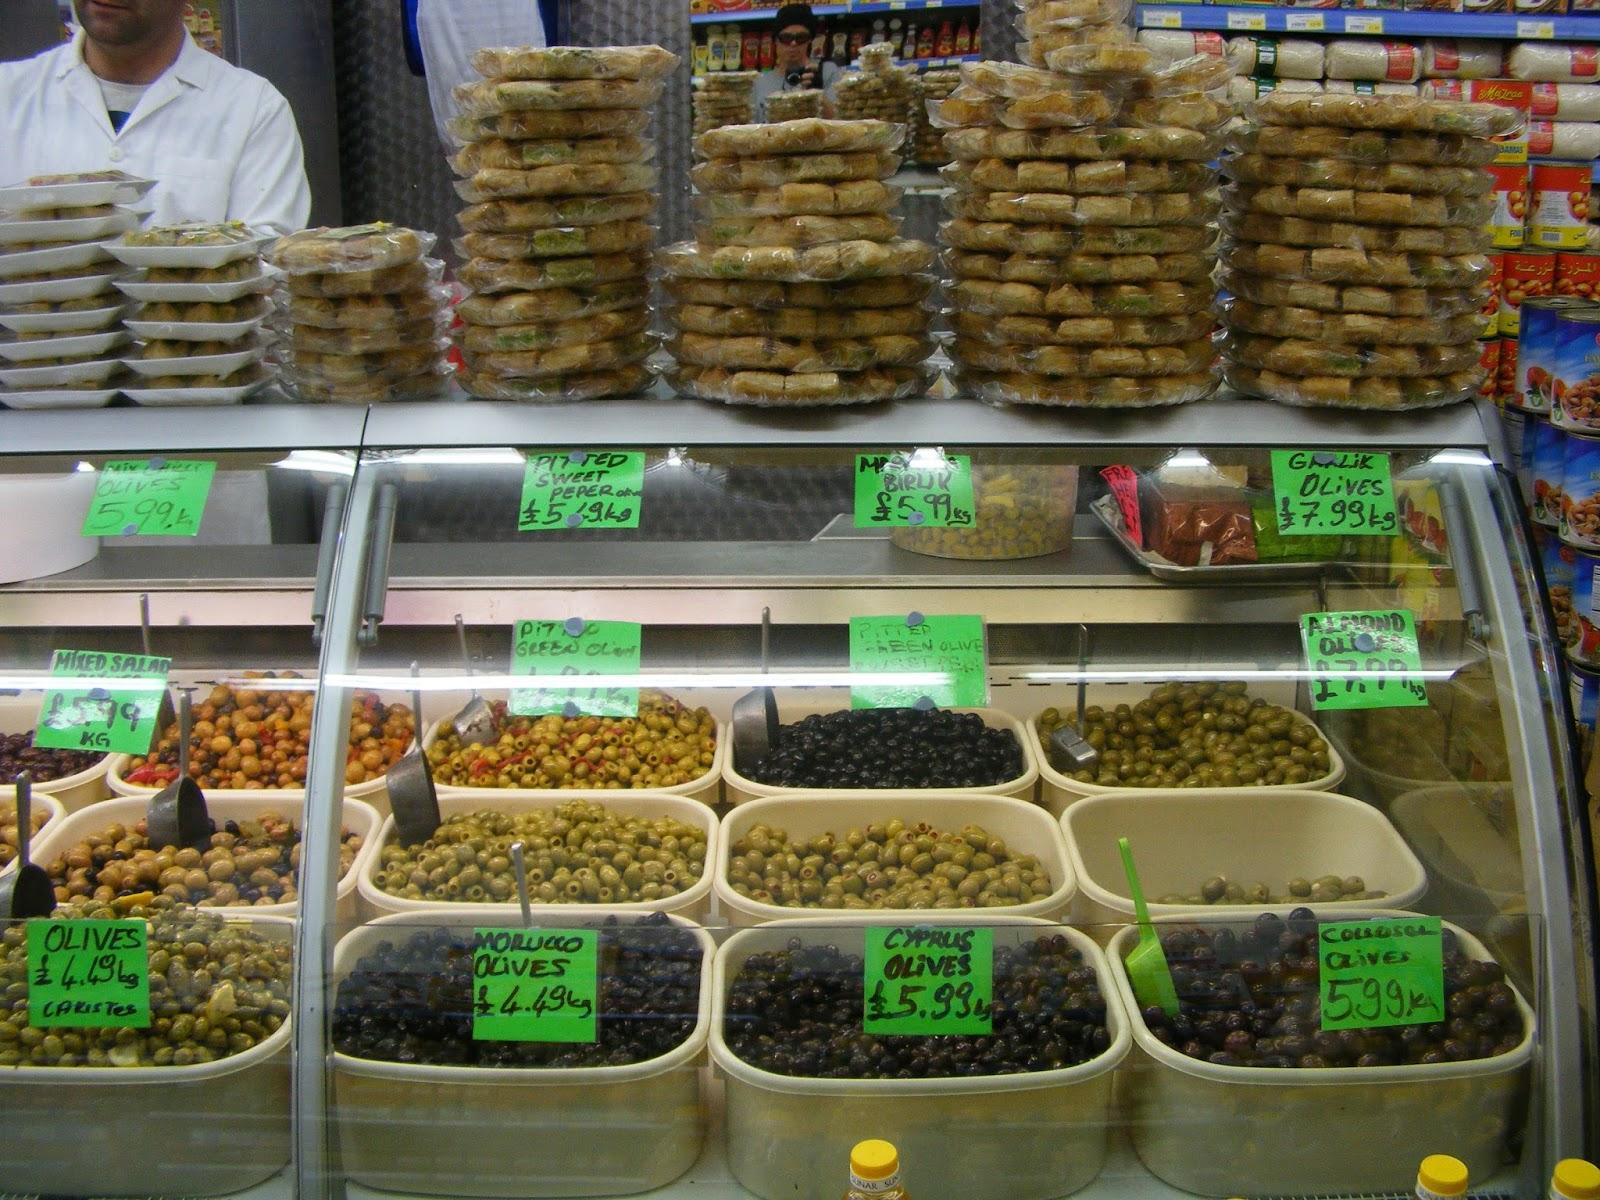 Peckham food what we eat when we eat in peckham alligator justice turkish olive bar i go for the far right olives tasty fandeluxe Images